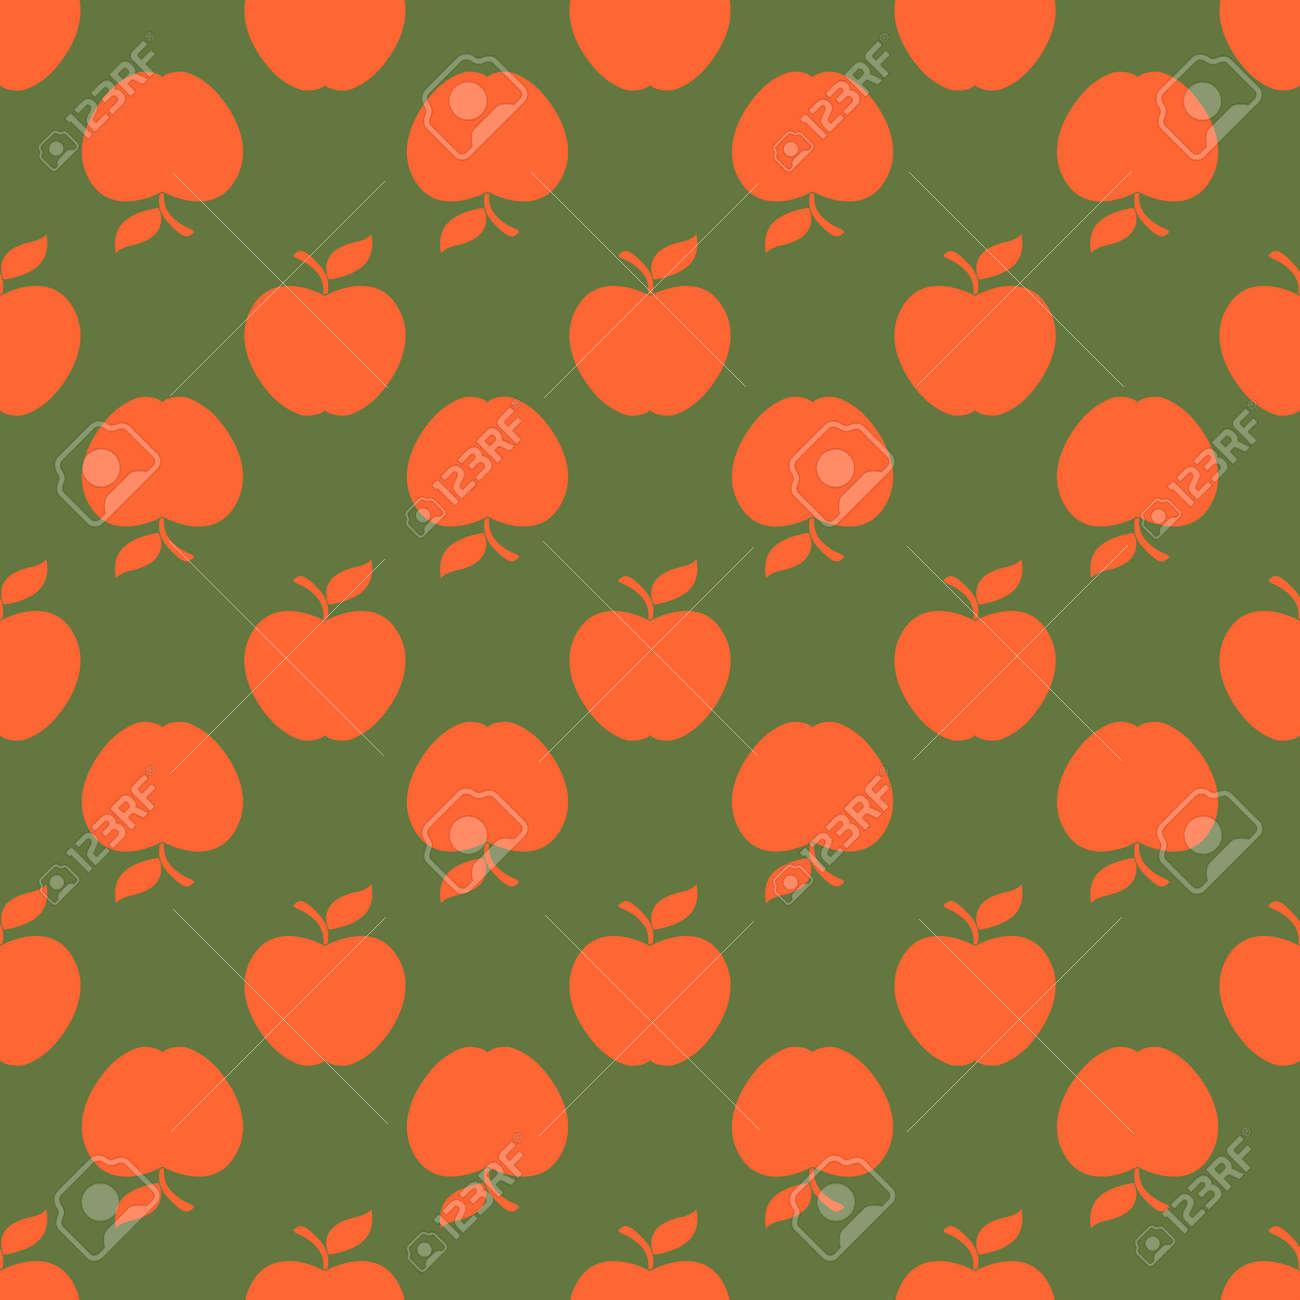 Apple green orange seamless pattern background. Vector illustration. Stock Vector - 92292469